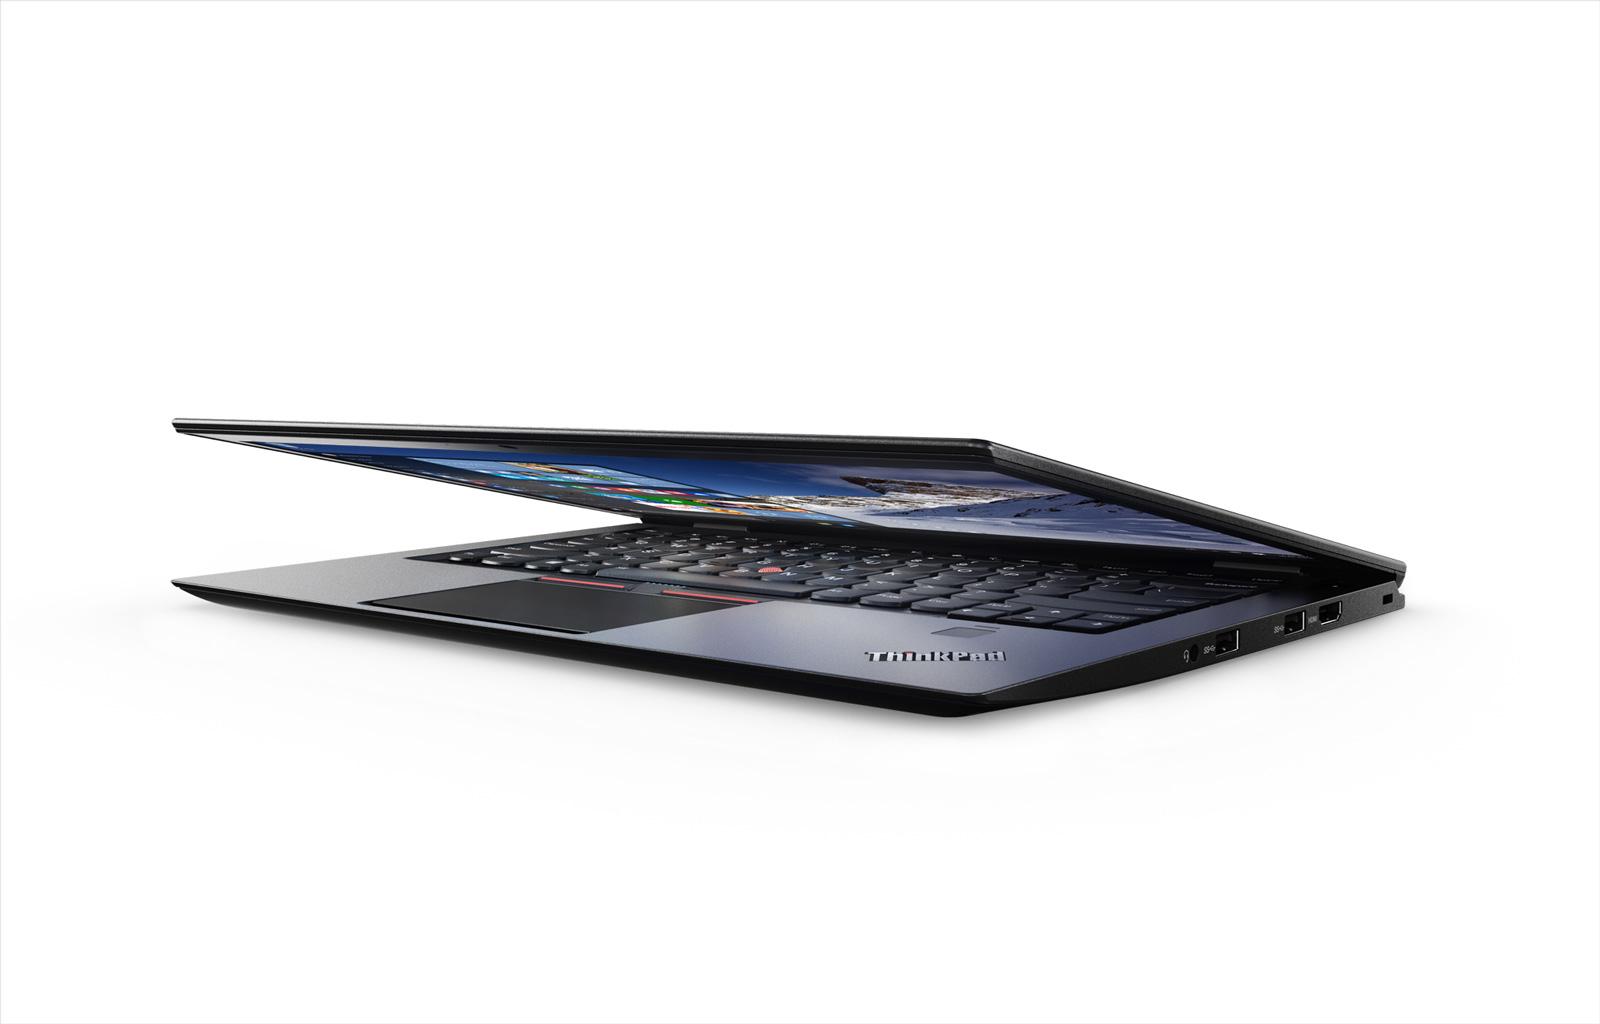 Фото  Ультрабук ThinkPad X1 Carbon 5th Gen (20HR0069RT)